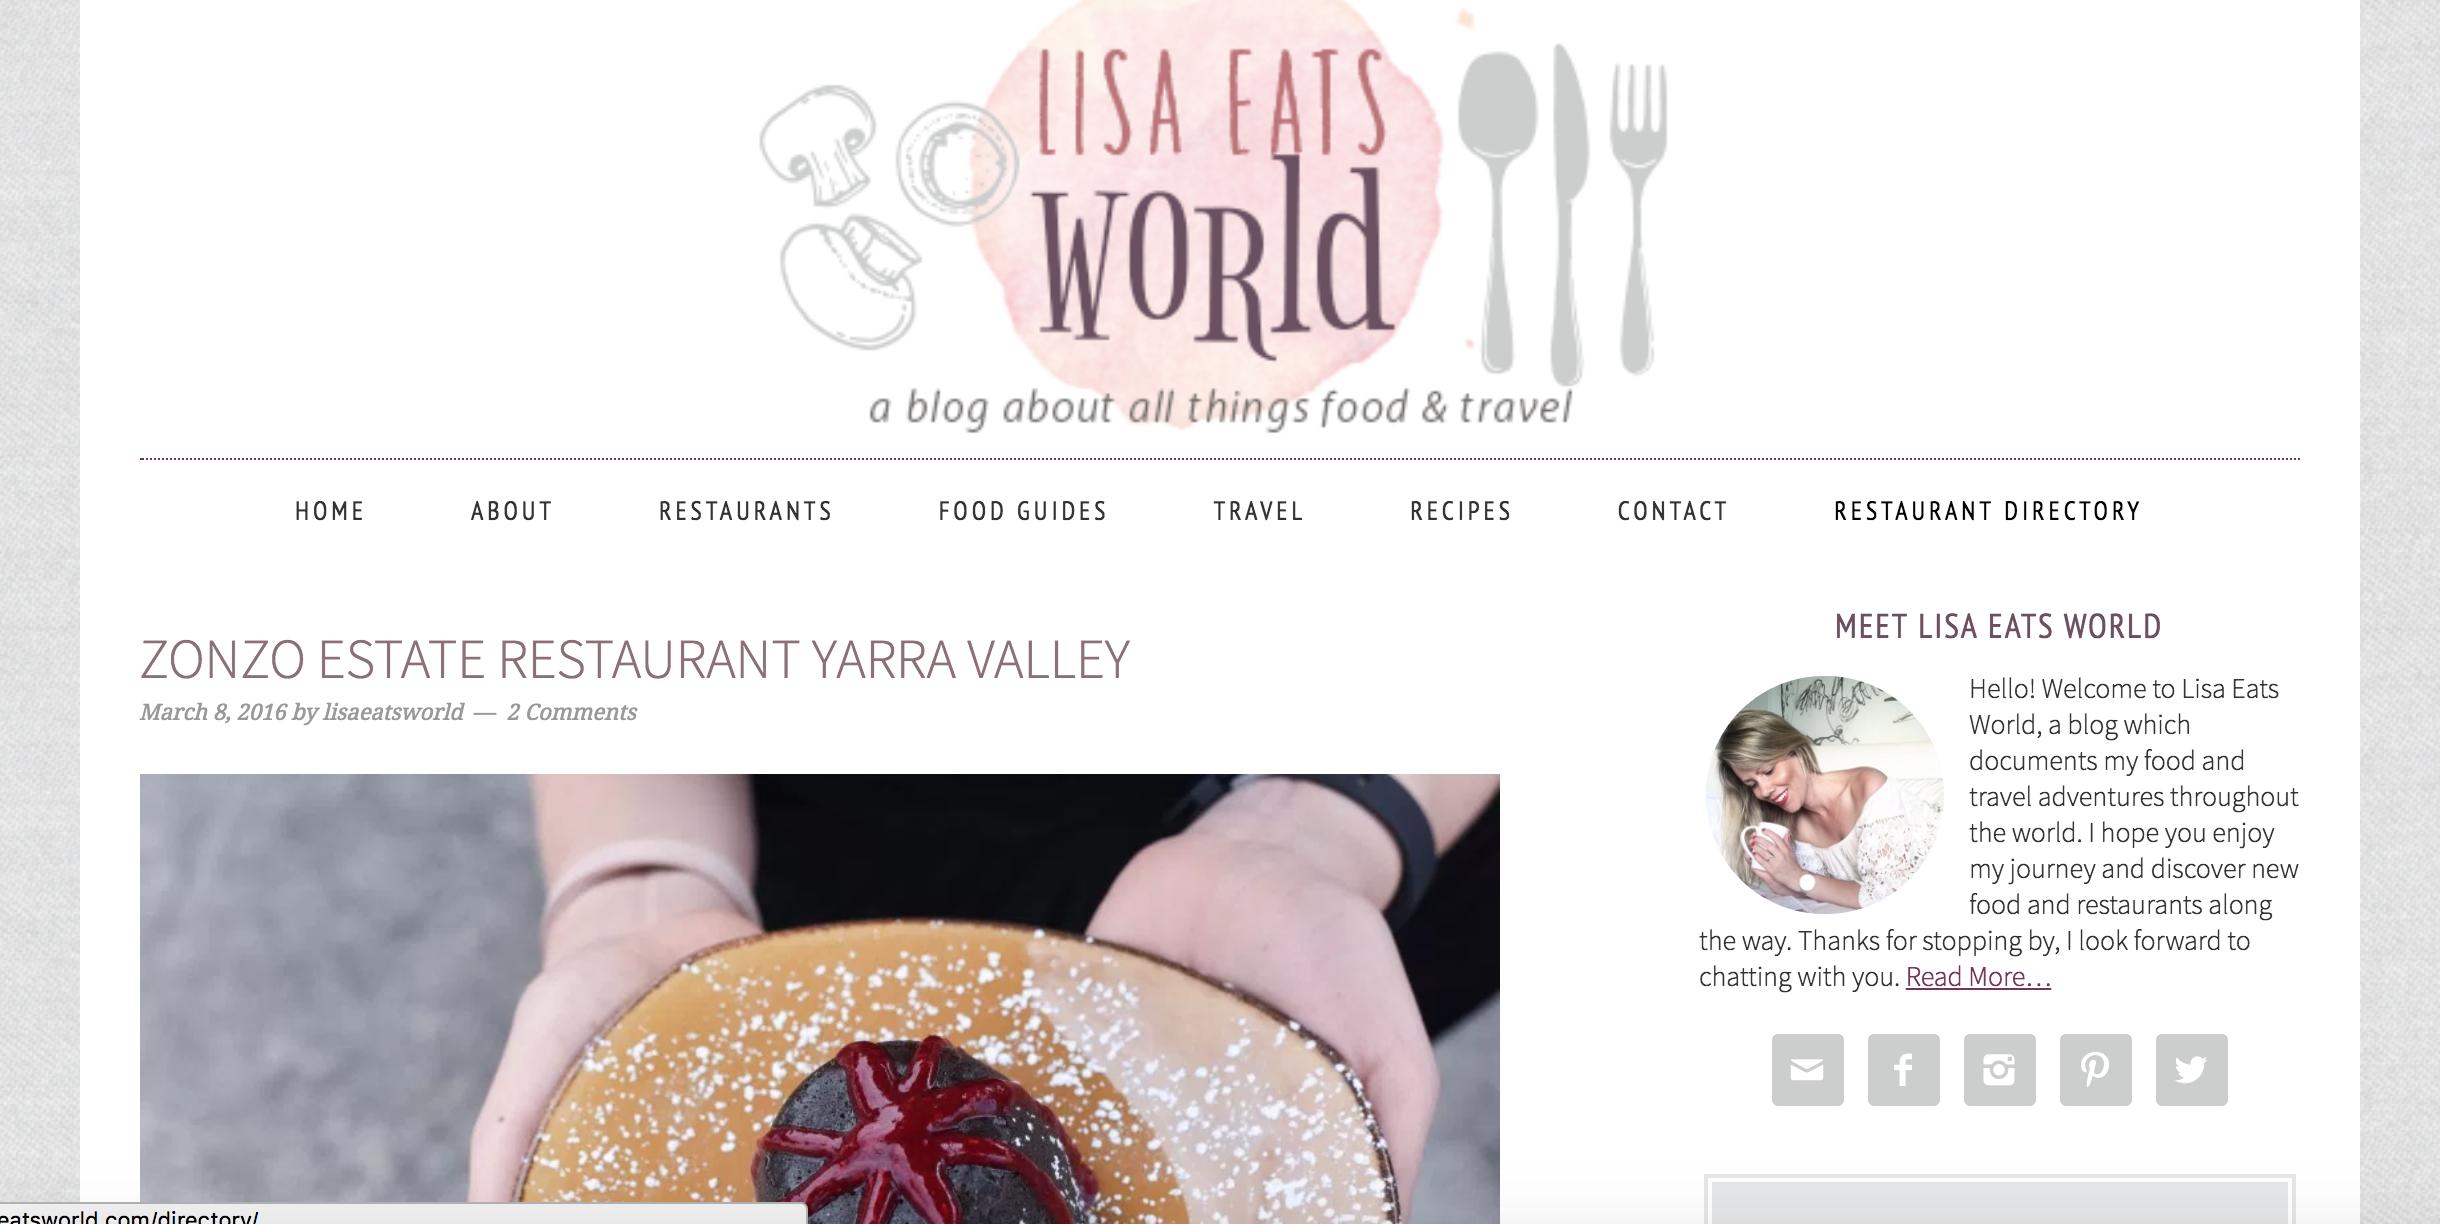 Lisa Eats World Blog Coverage.png